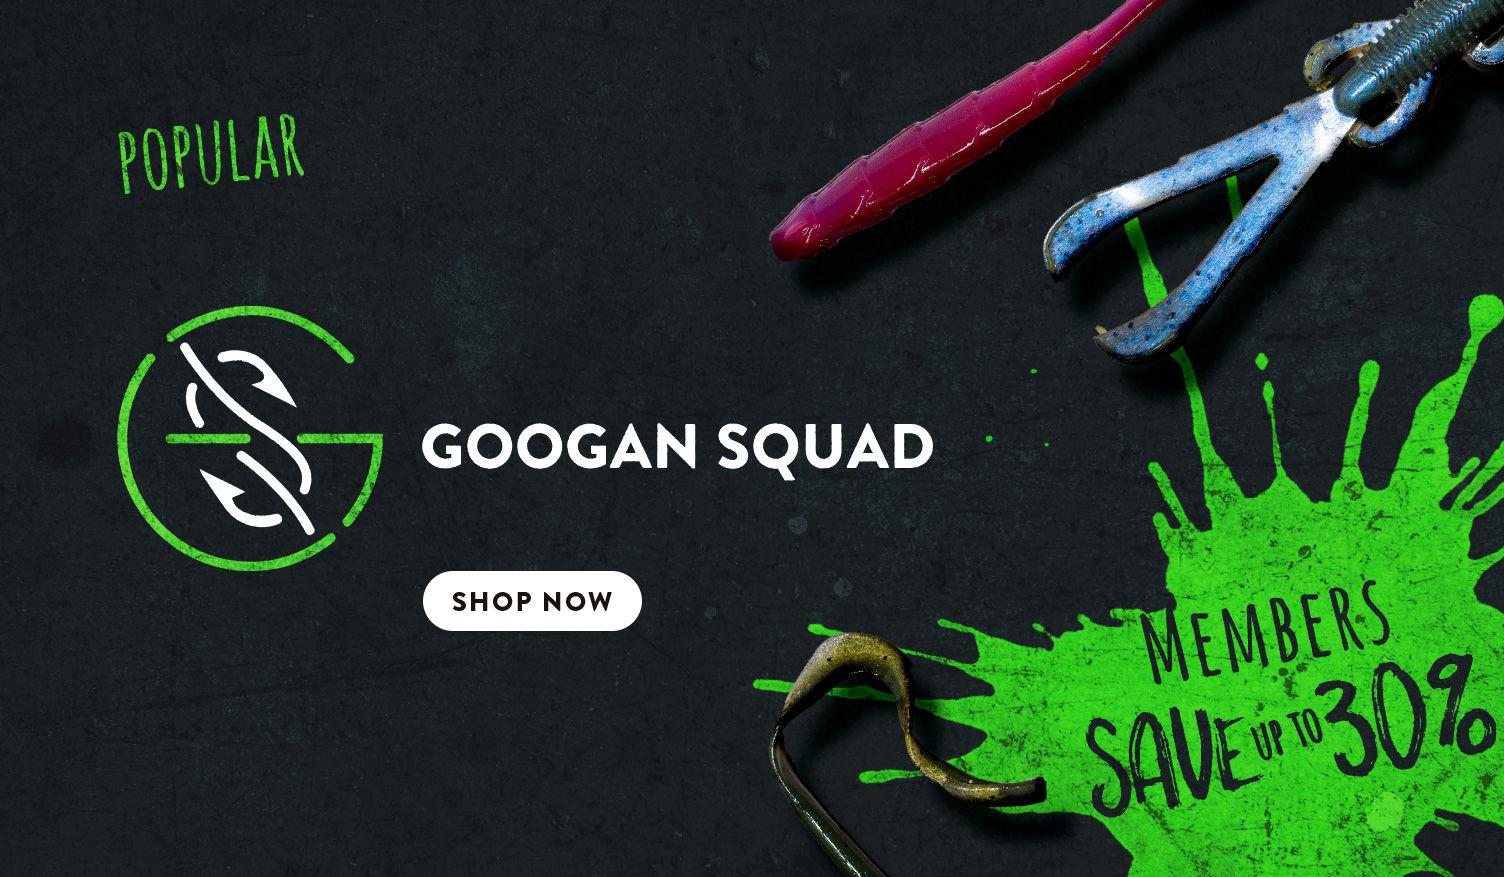 Googan Squad Baits